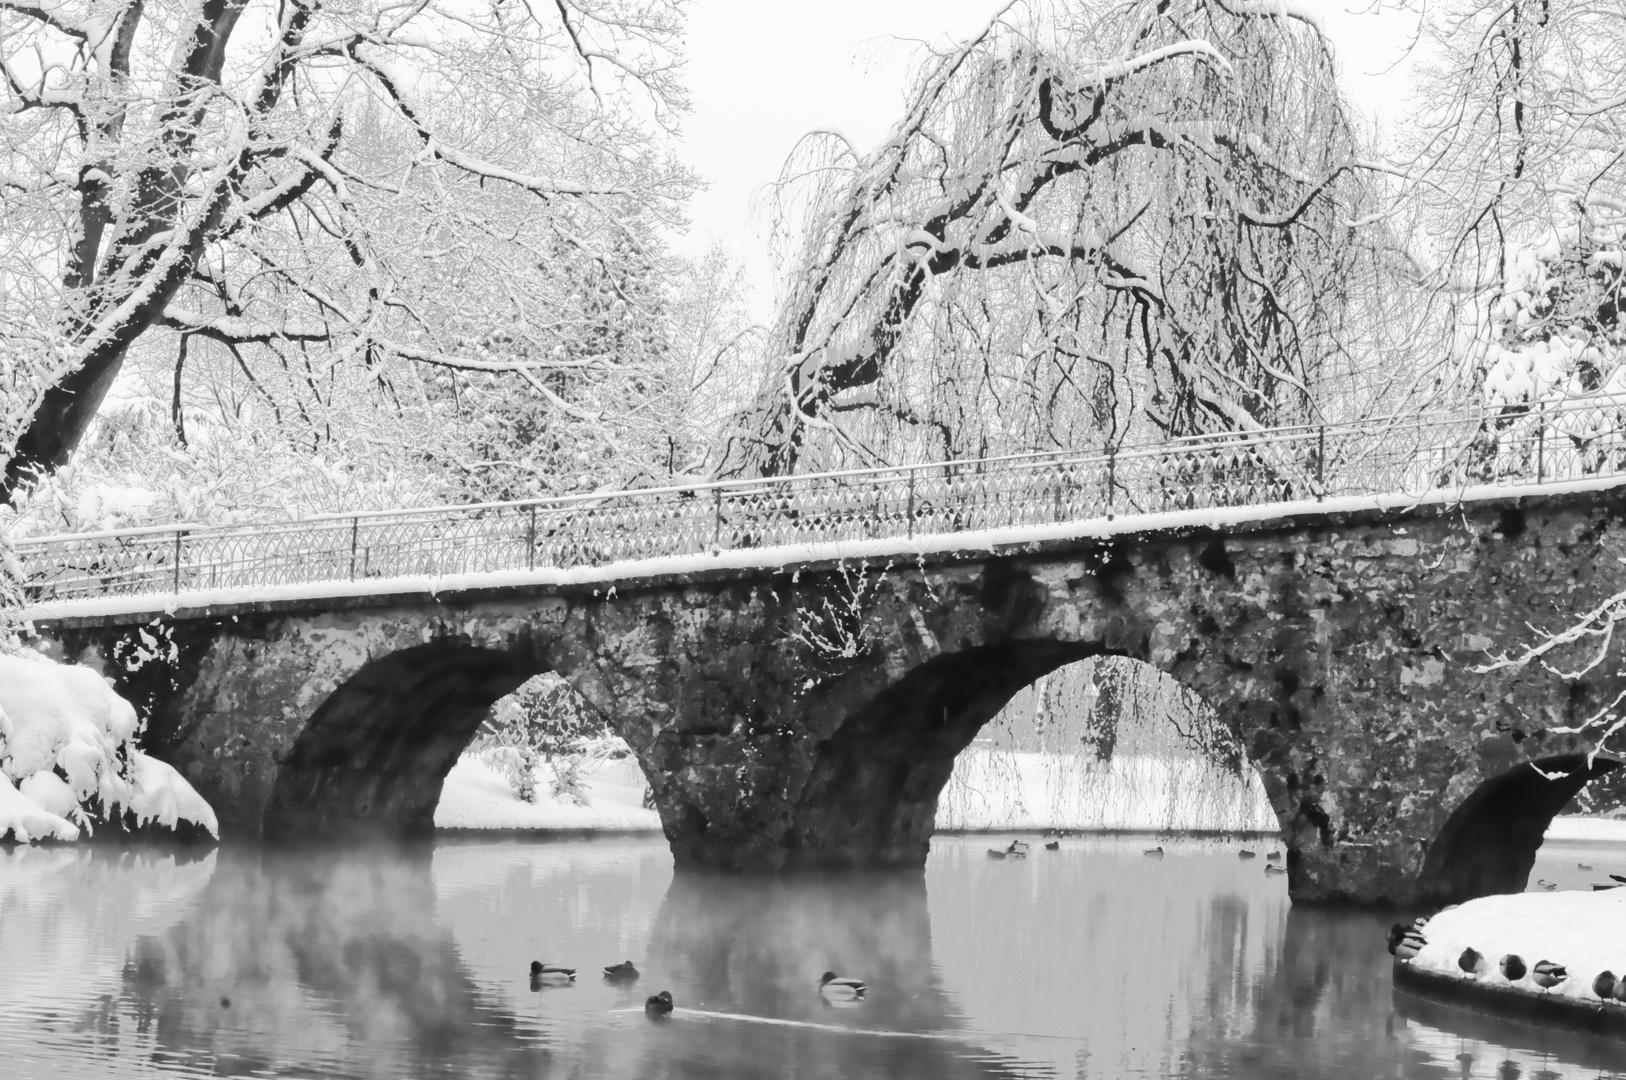 ne stinknormale Brücke im Winter